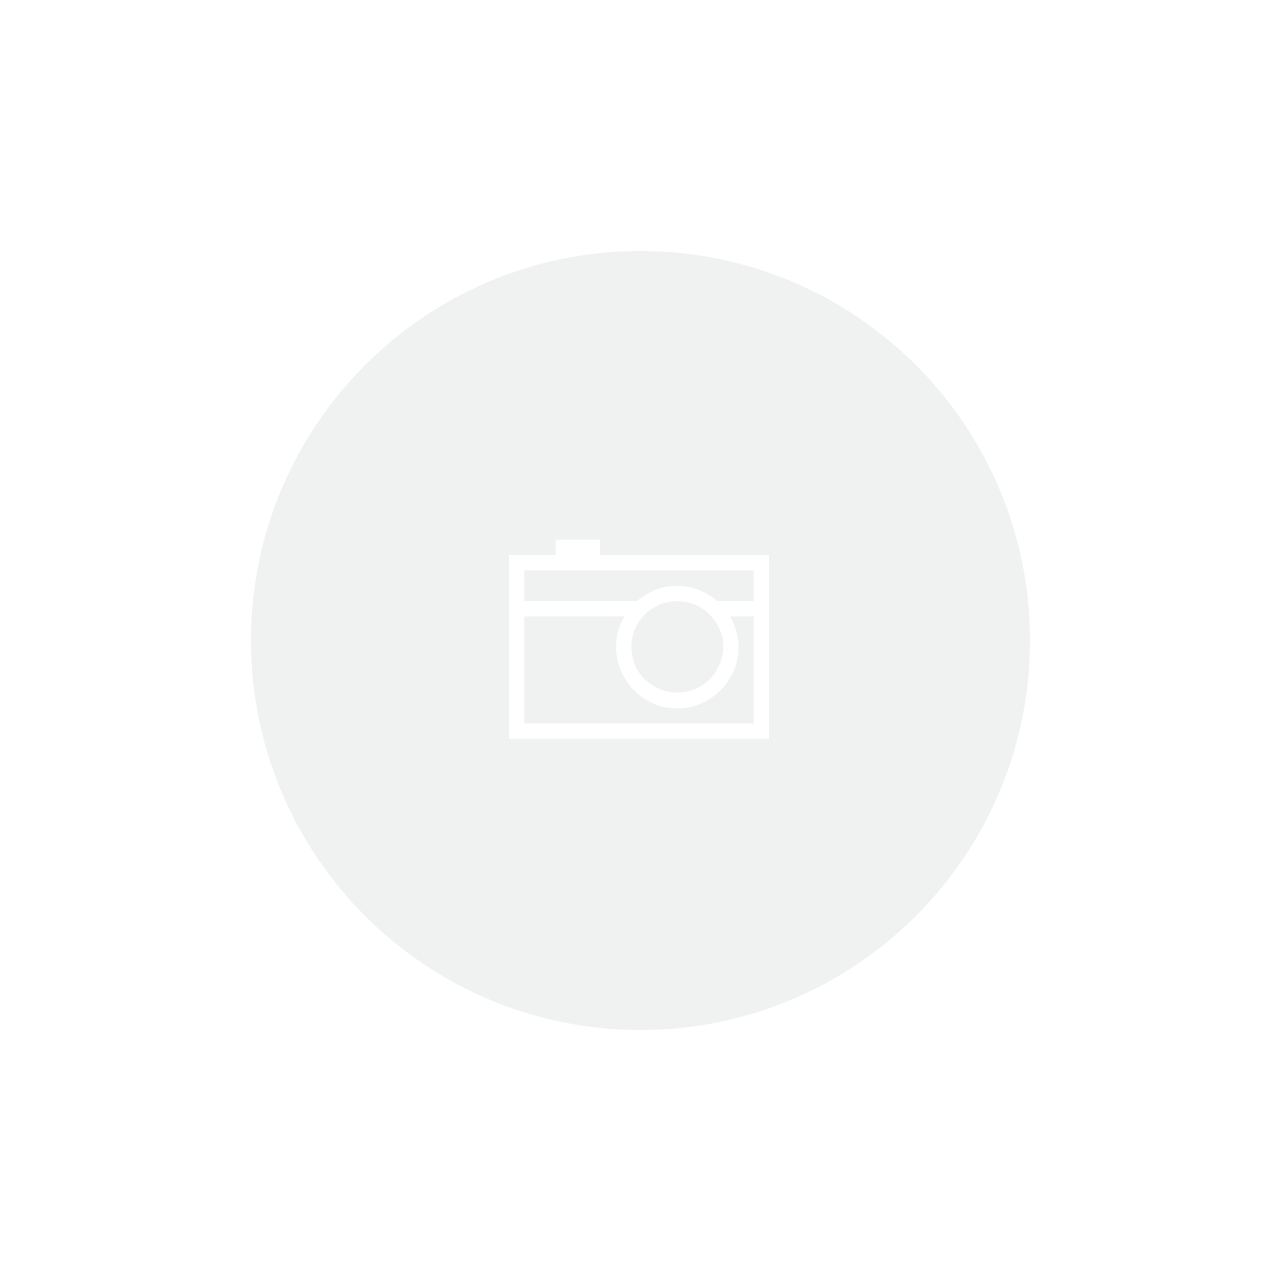 CÂMBIO TRASEIRO SHIMANO XTR 11/12V 2019 (KRDM9100SGS)